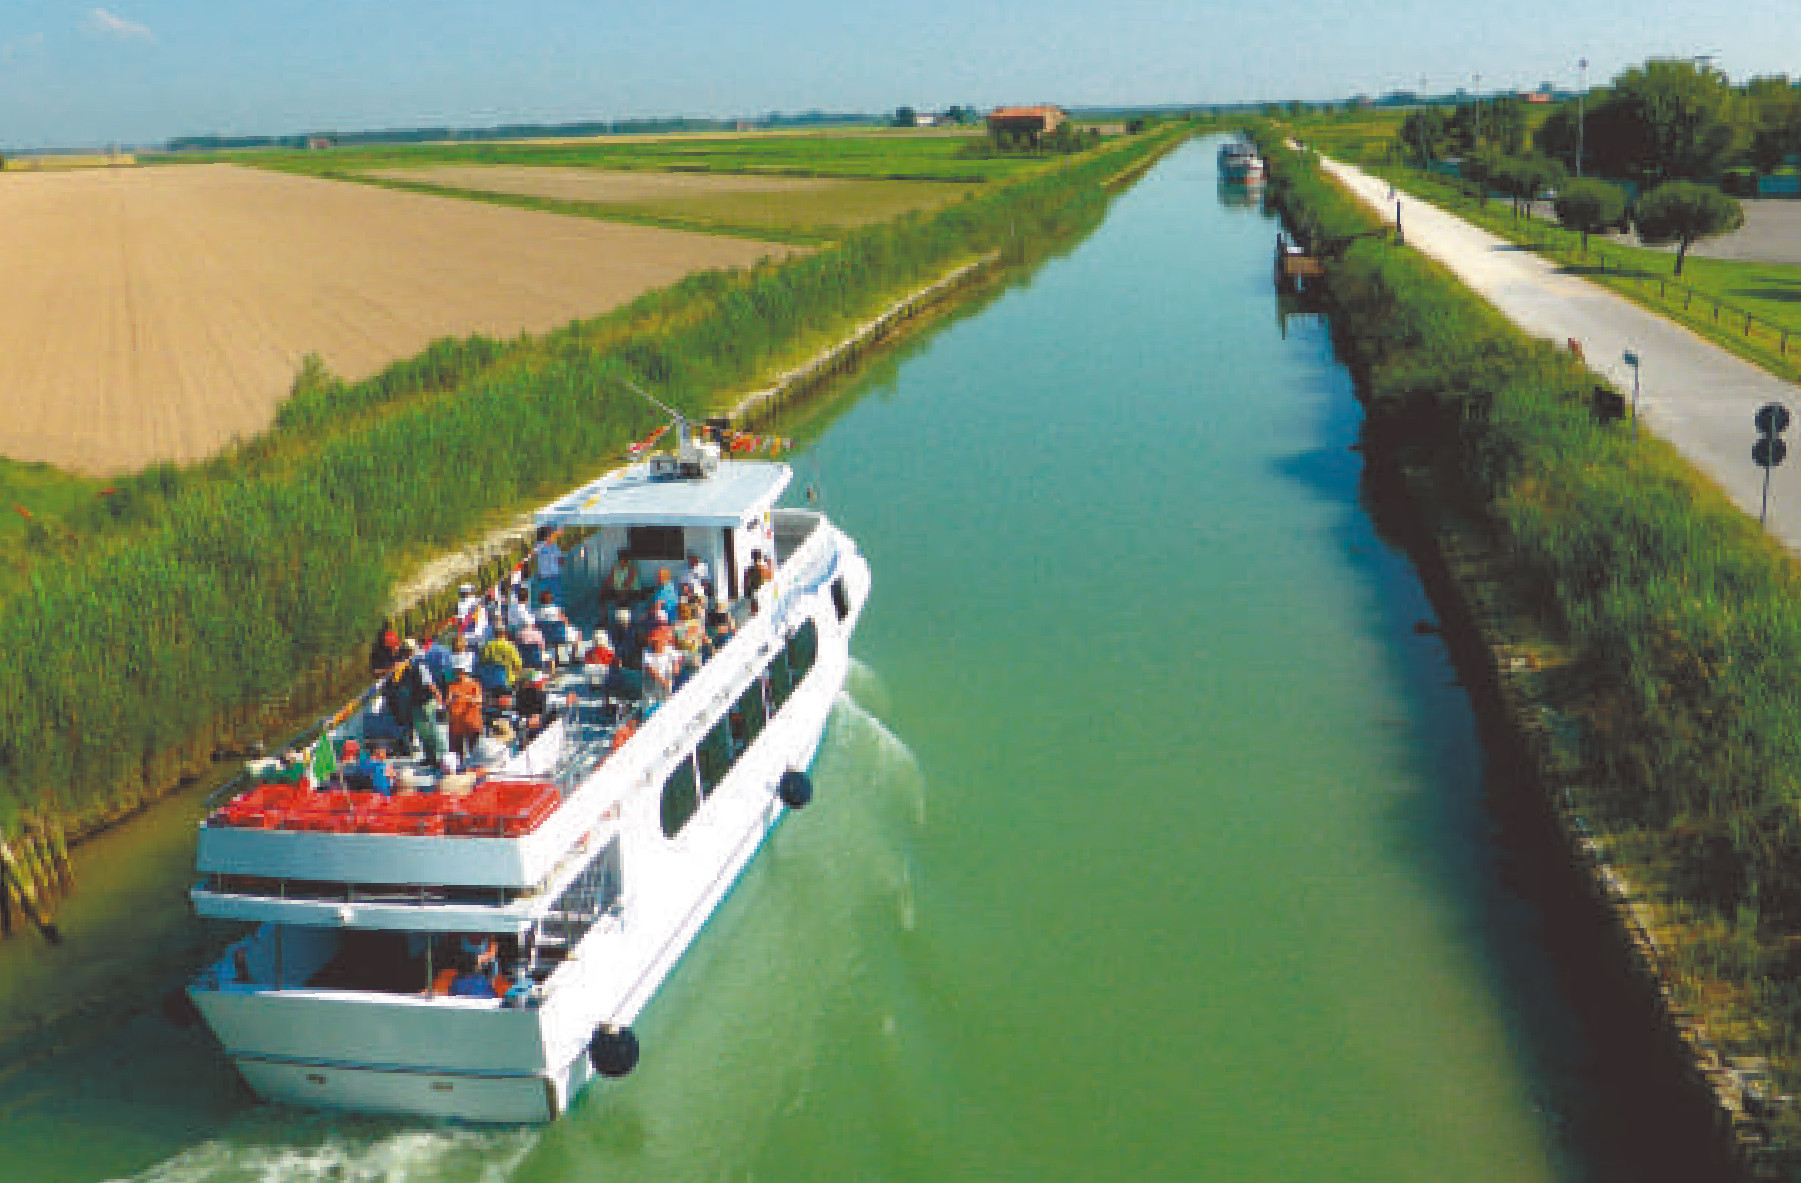 Ausflug mit dem Lagunenboot - Caorle